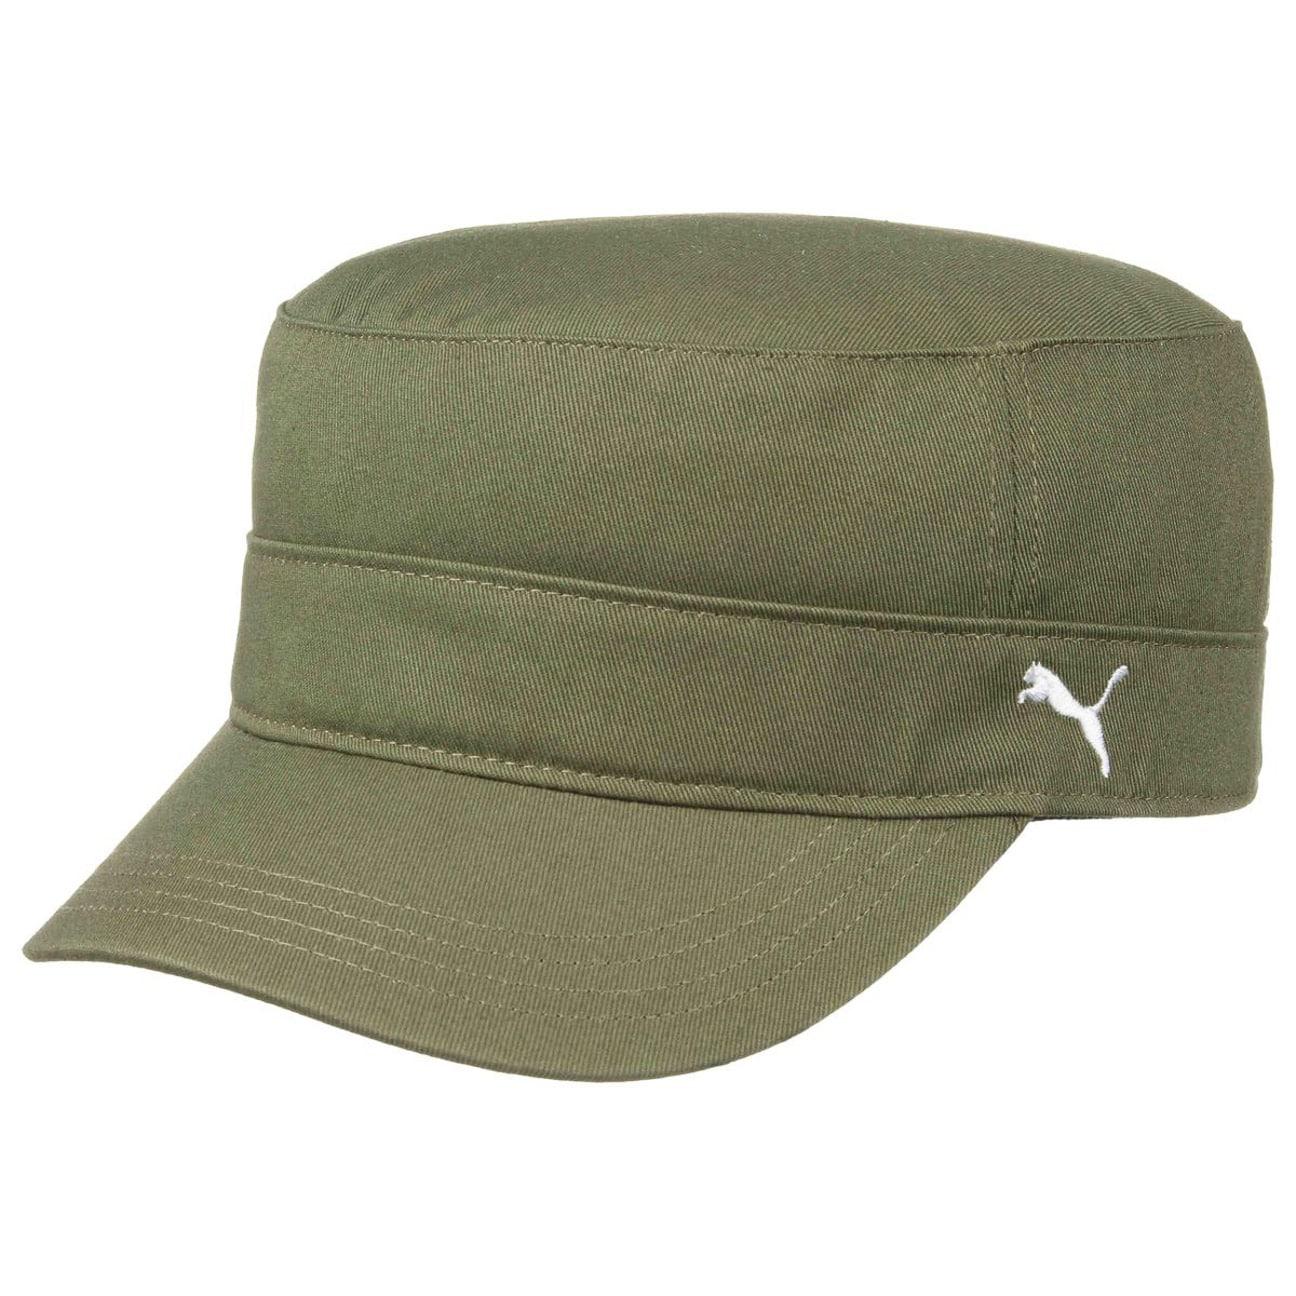 a598438392aec Gorra Militar Essential by PUMA - Gorras - sombreroshop.es